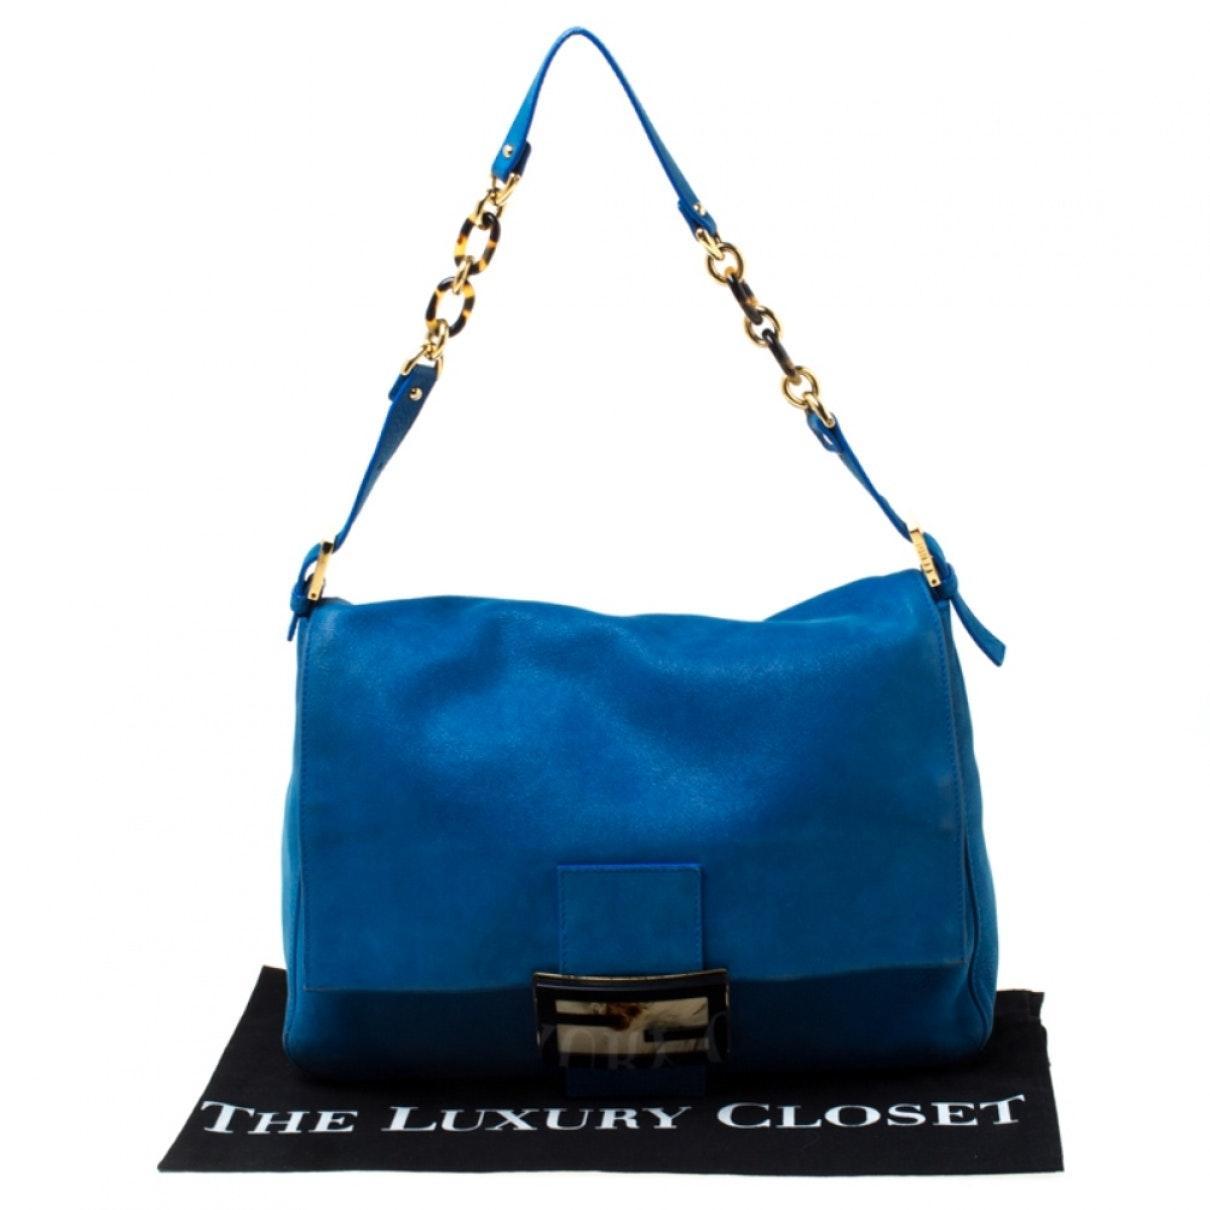 Fendi Leder Leder Handtaschen in Blau B2rw1